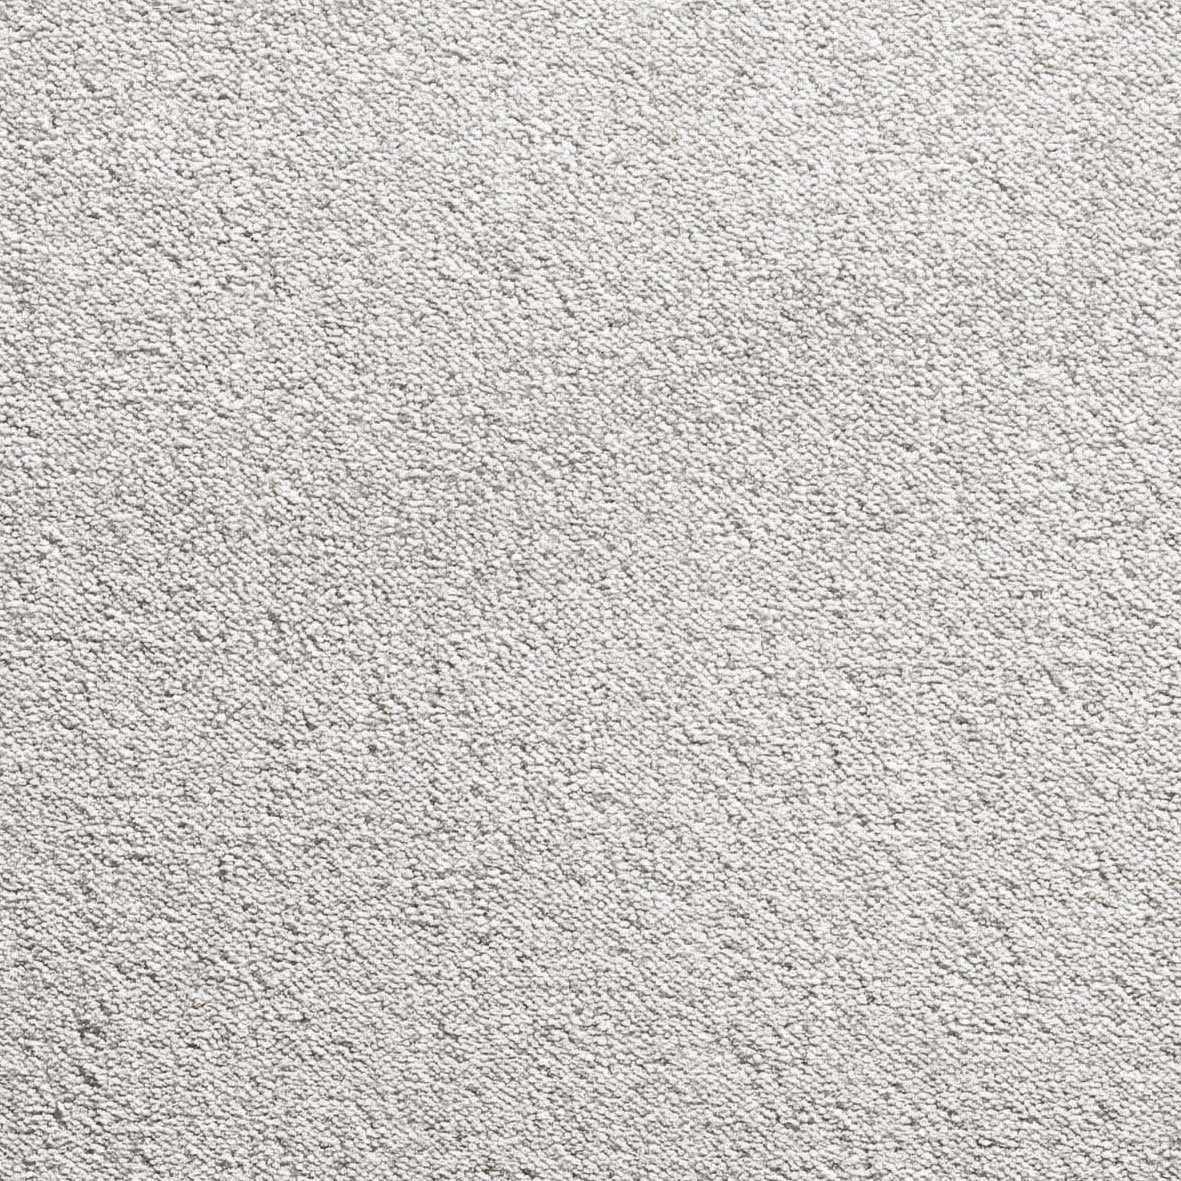 moquette velours satino grise 4 m leroy merlin. Black Bedroom Furniture Sets. Home Design Ideas